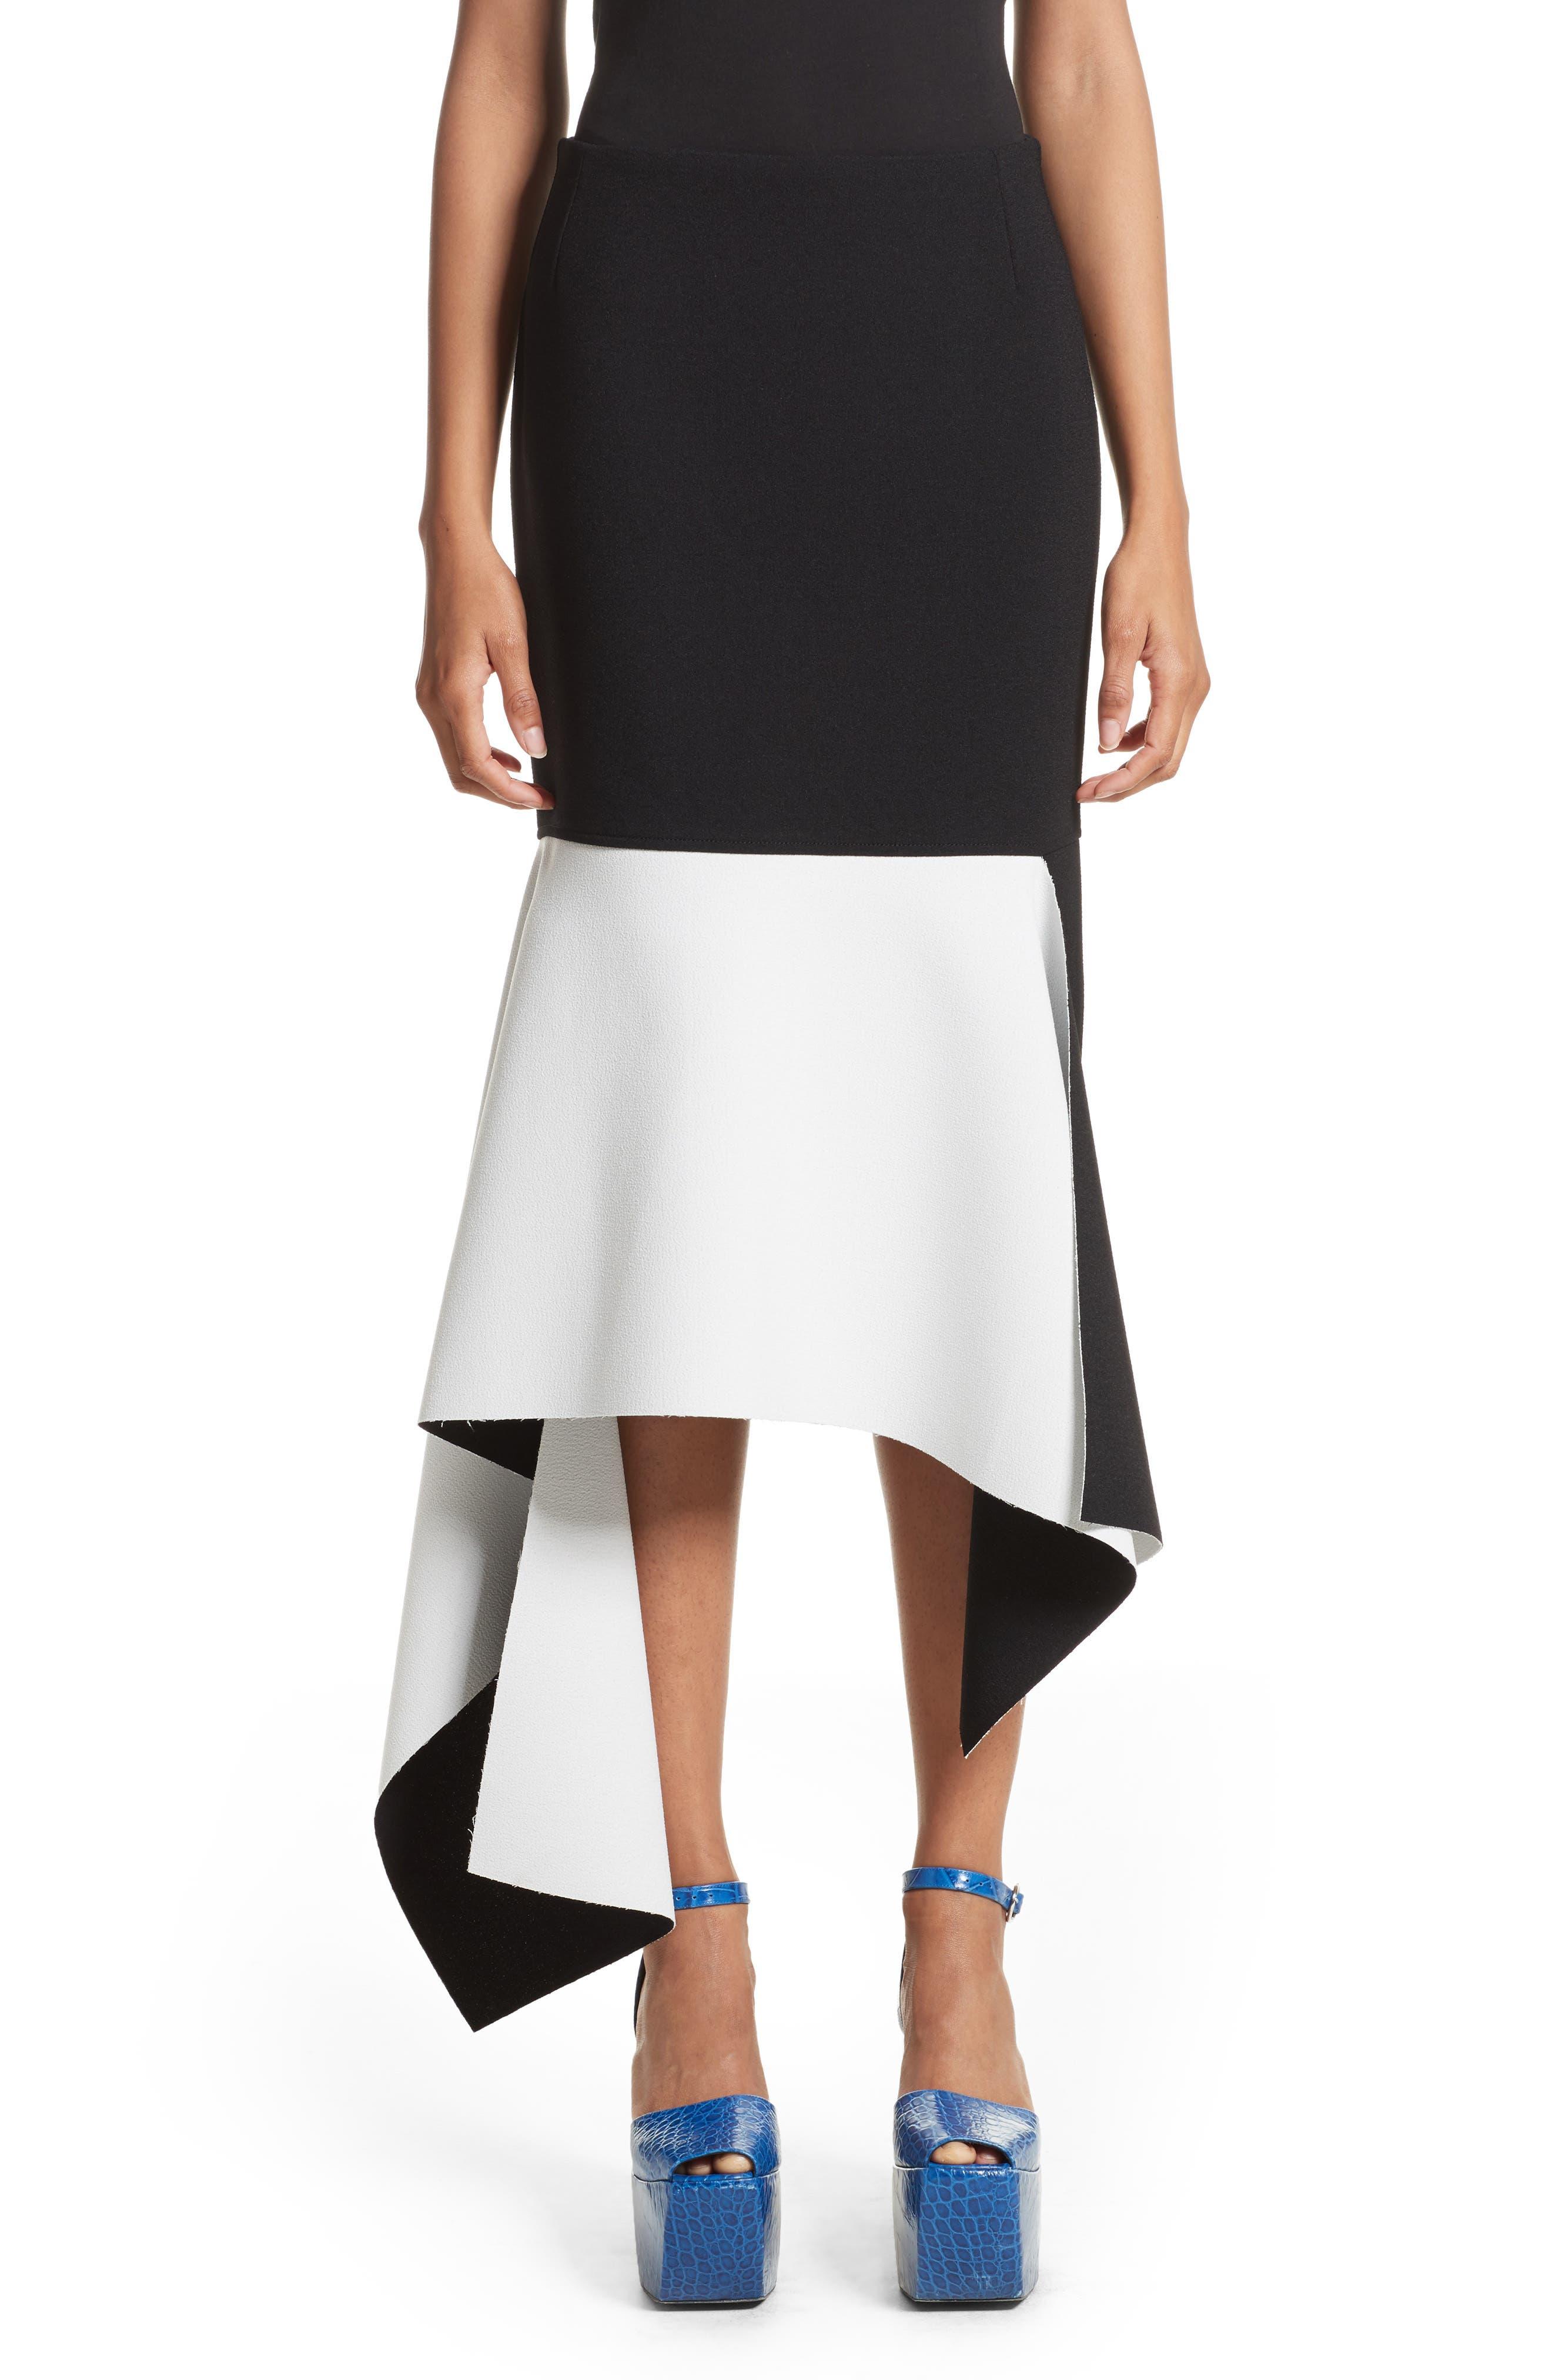 Alternate Image 1 Selected - Marques'Almeida Asymmetrical Bicolor Crepe Skirt